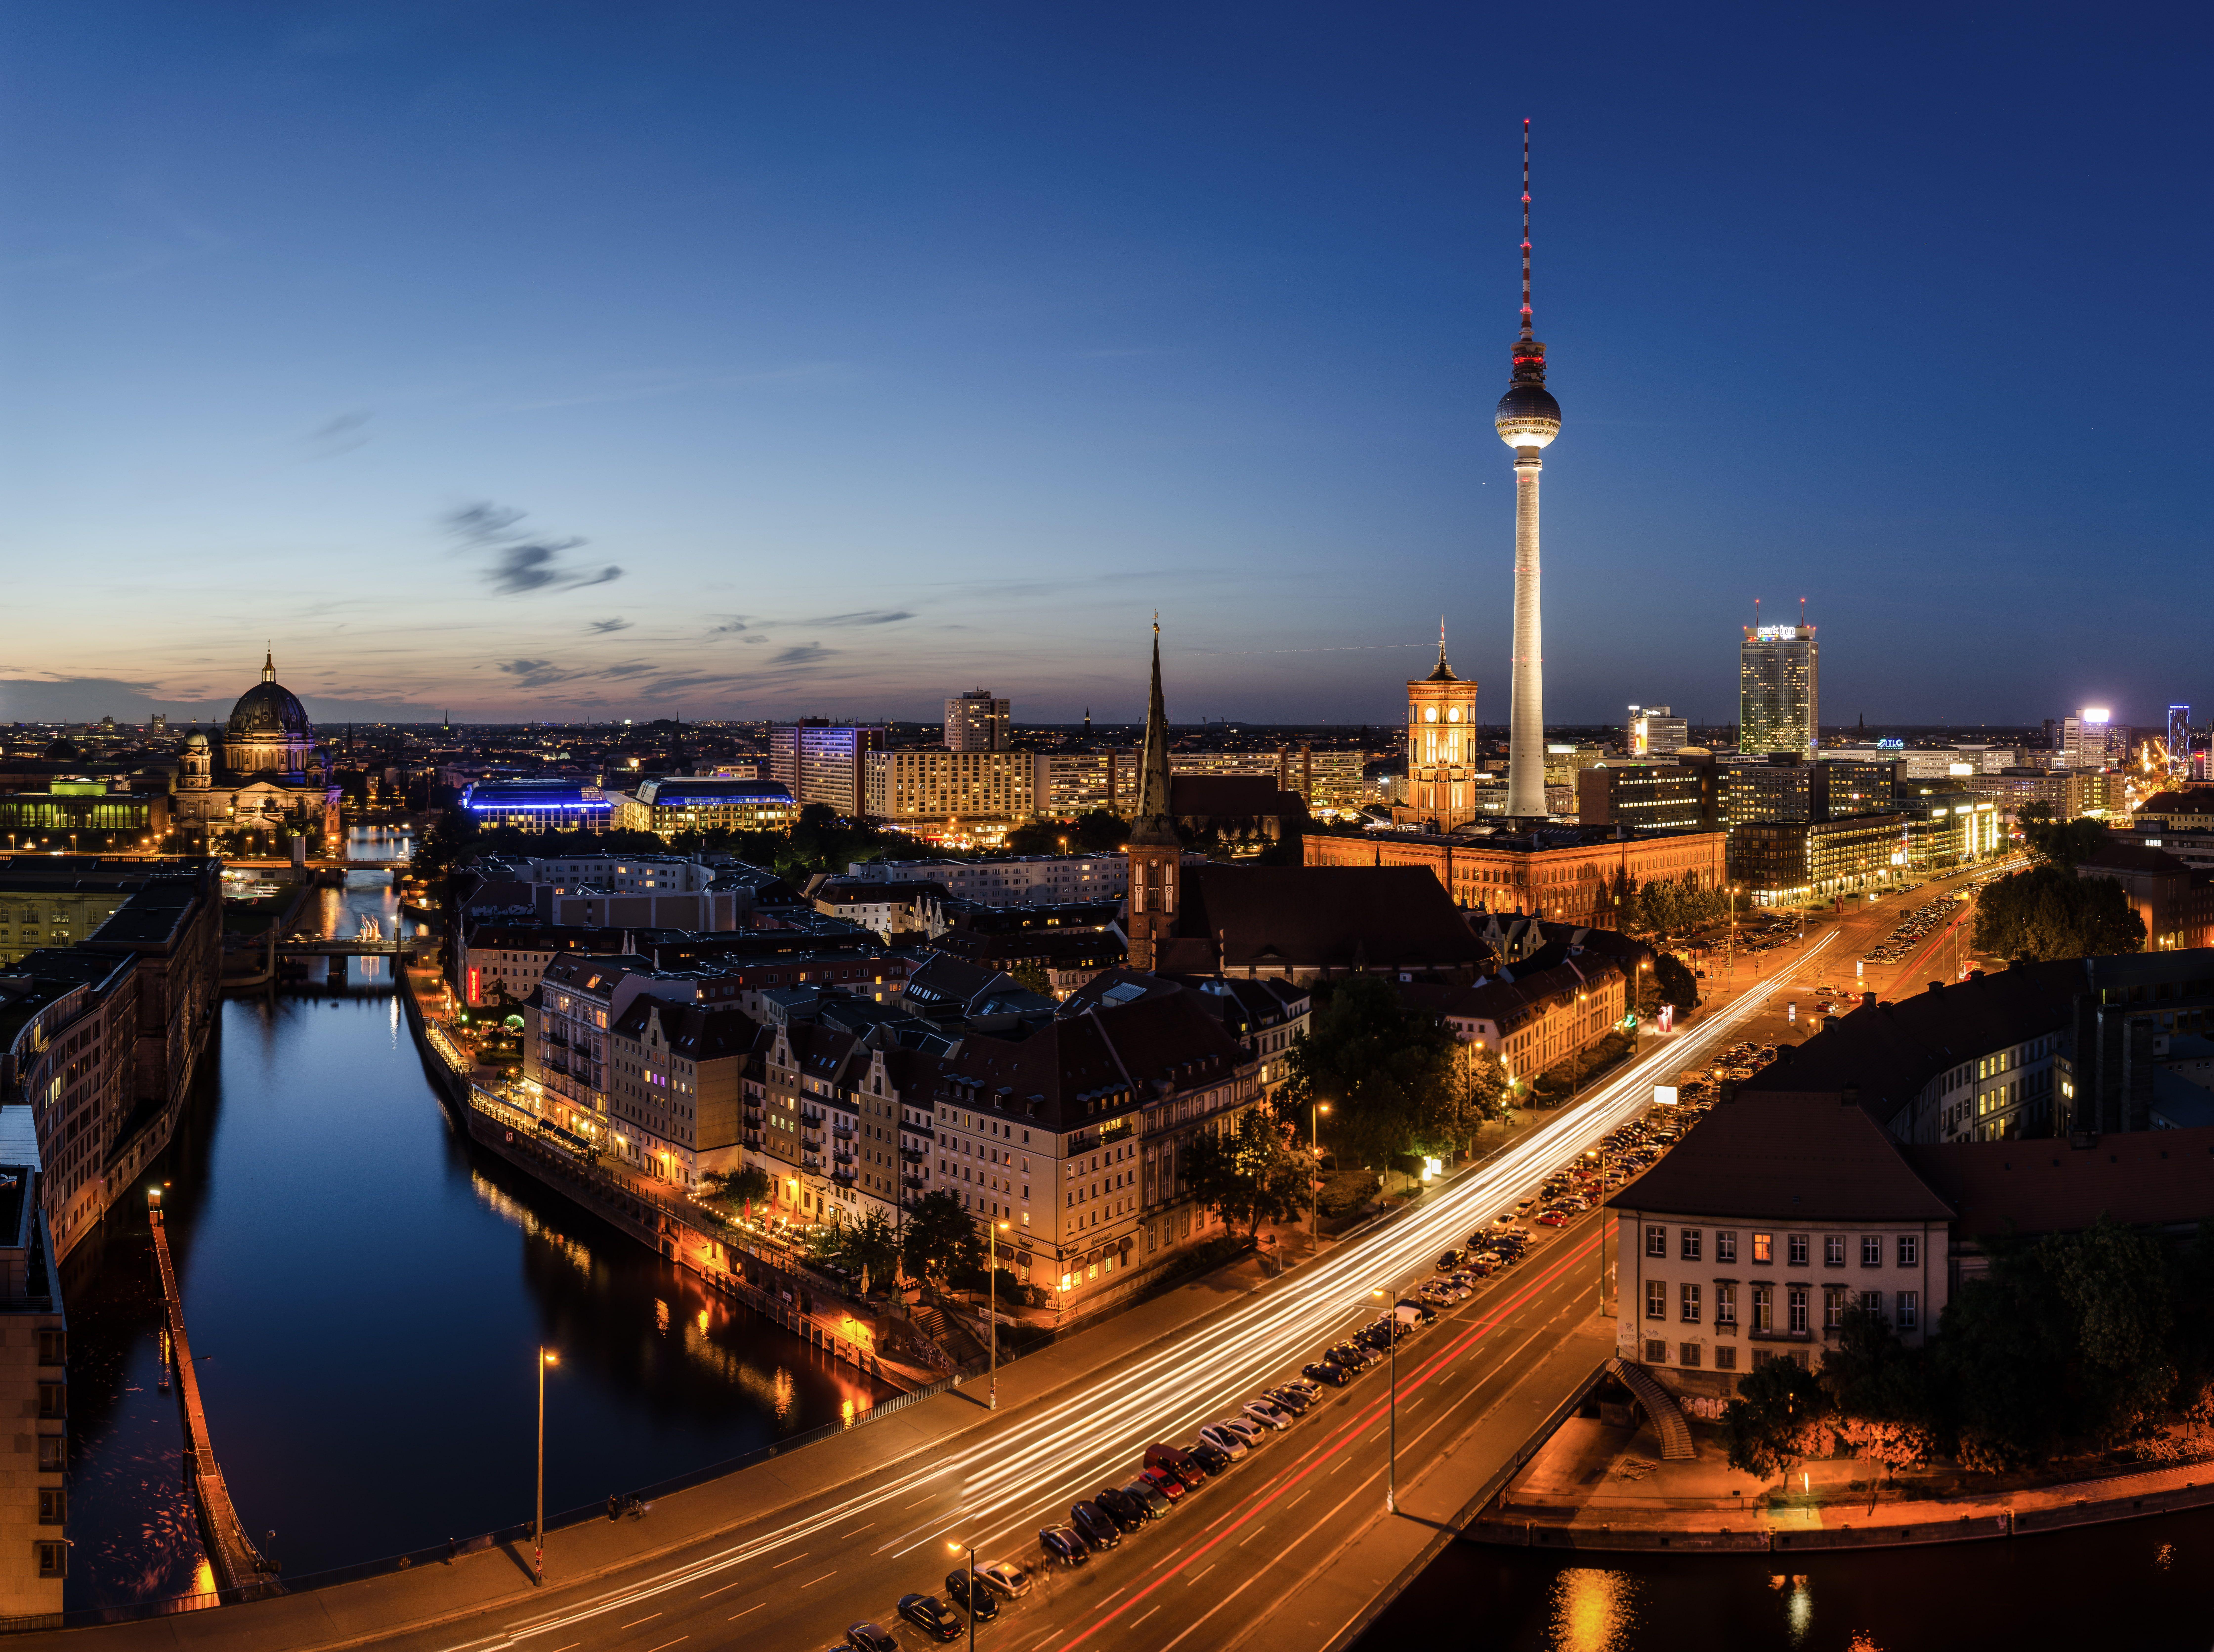 Berlin Skyline Night Bridge City The City Lights Lights Road Germany Road Bridge Street Night Street Germany Berlin Ber In 2020 Skyline Bridge City City